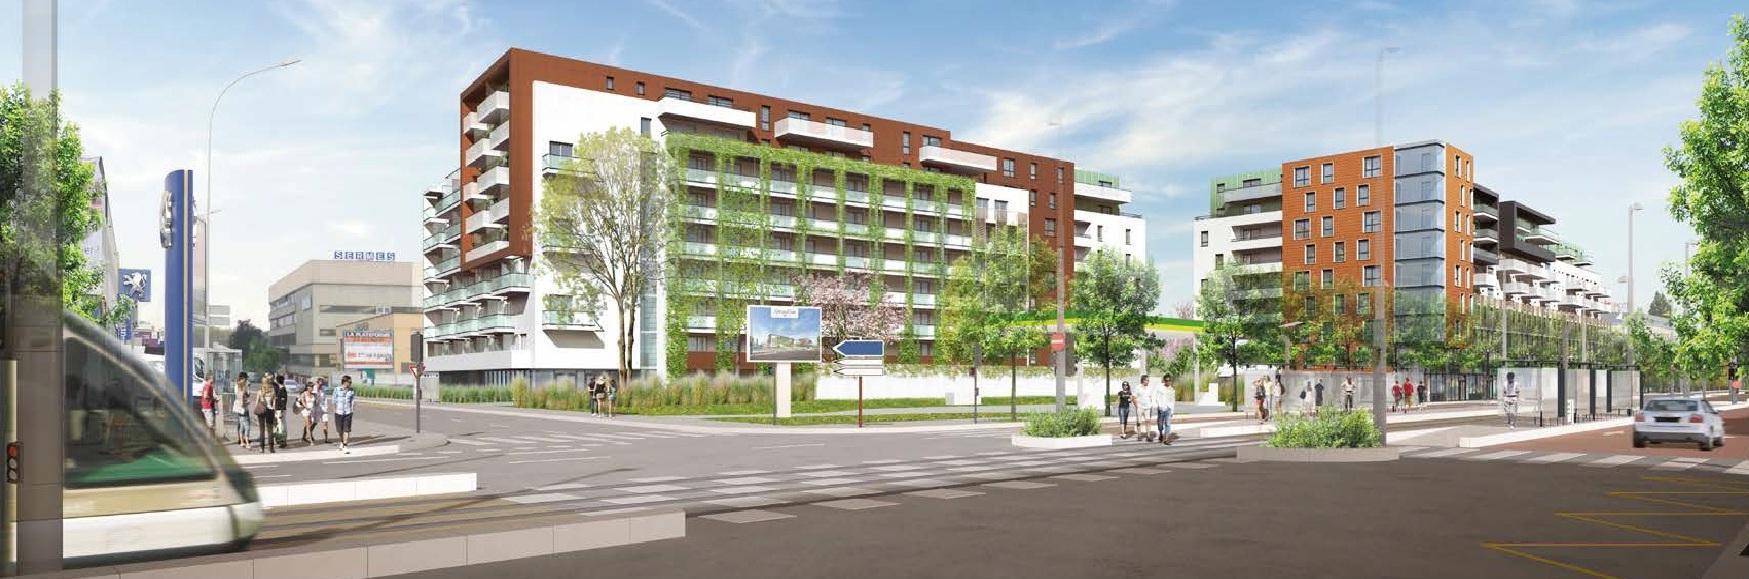 strasbourg actu urbaine architecturale page 497 skyscrapercity. Black Bedroom Furniture Sets. Home Design Ideas